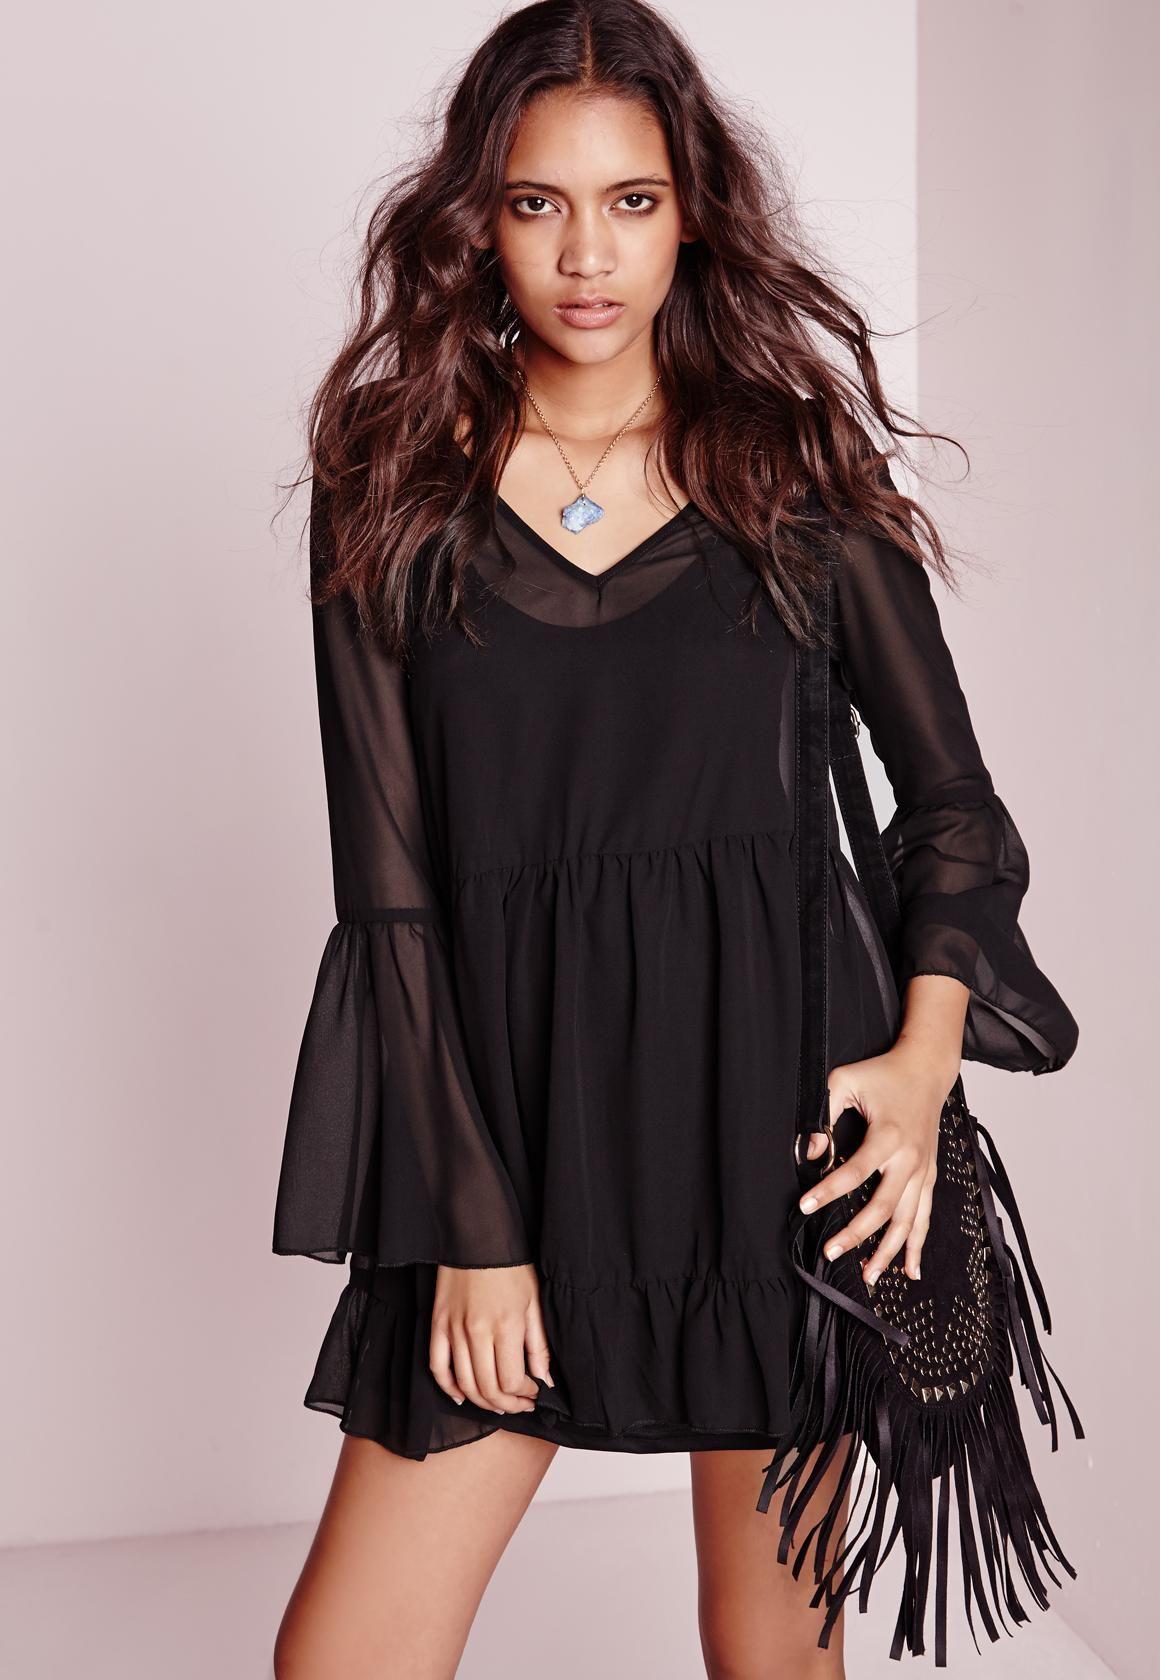 Missguided - Chiffon Bell Sleeve Swing Dress Black